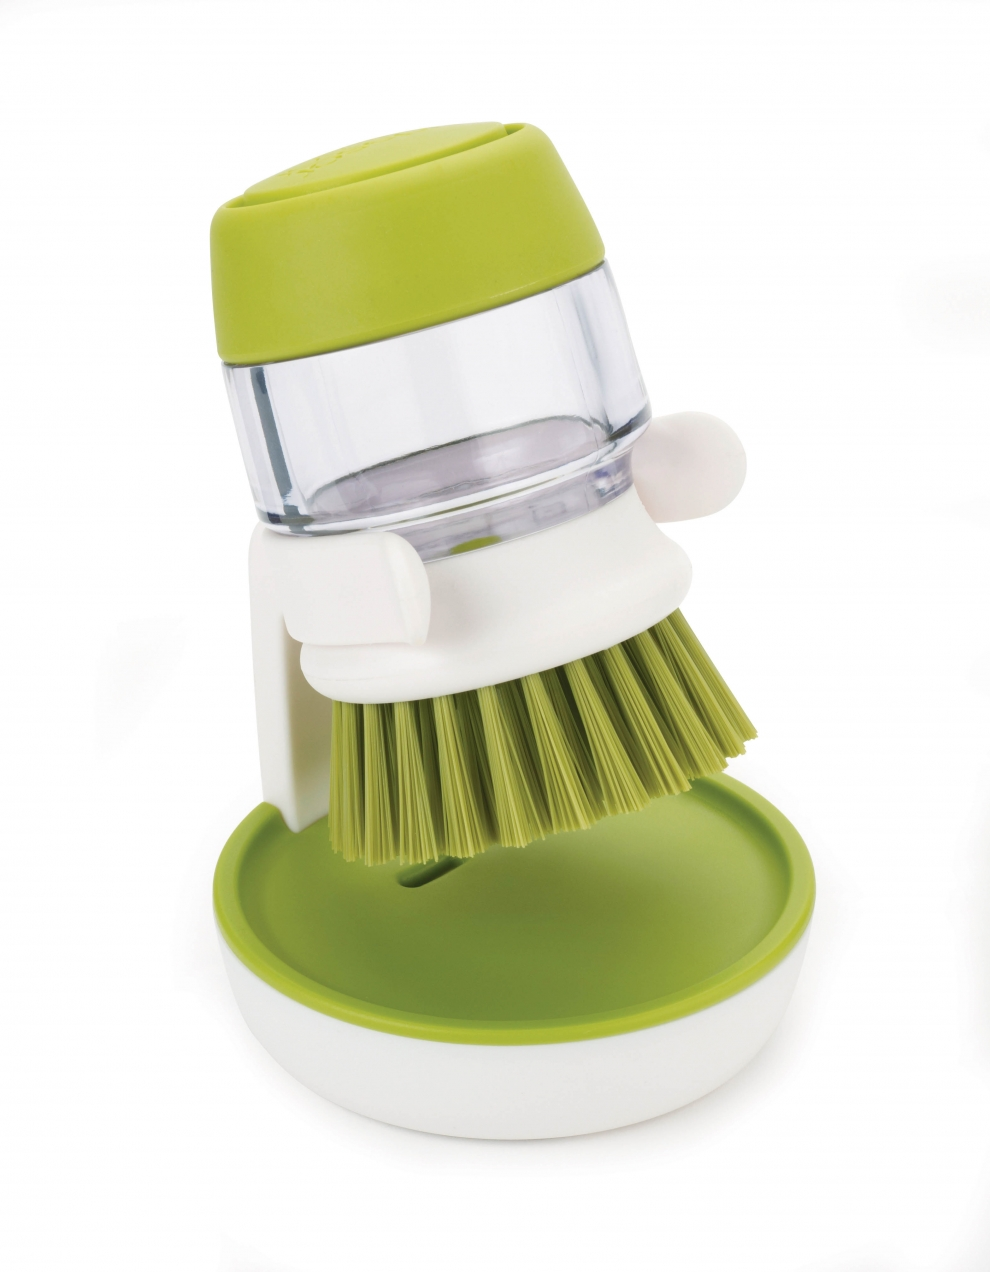 joseph joseph brosse vaisselle ronde avec r servoir et reposoir vert blanc 85004 85004. Black Bedroom Furniture Sets. Home Design Ideas